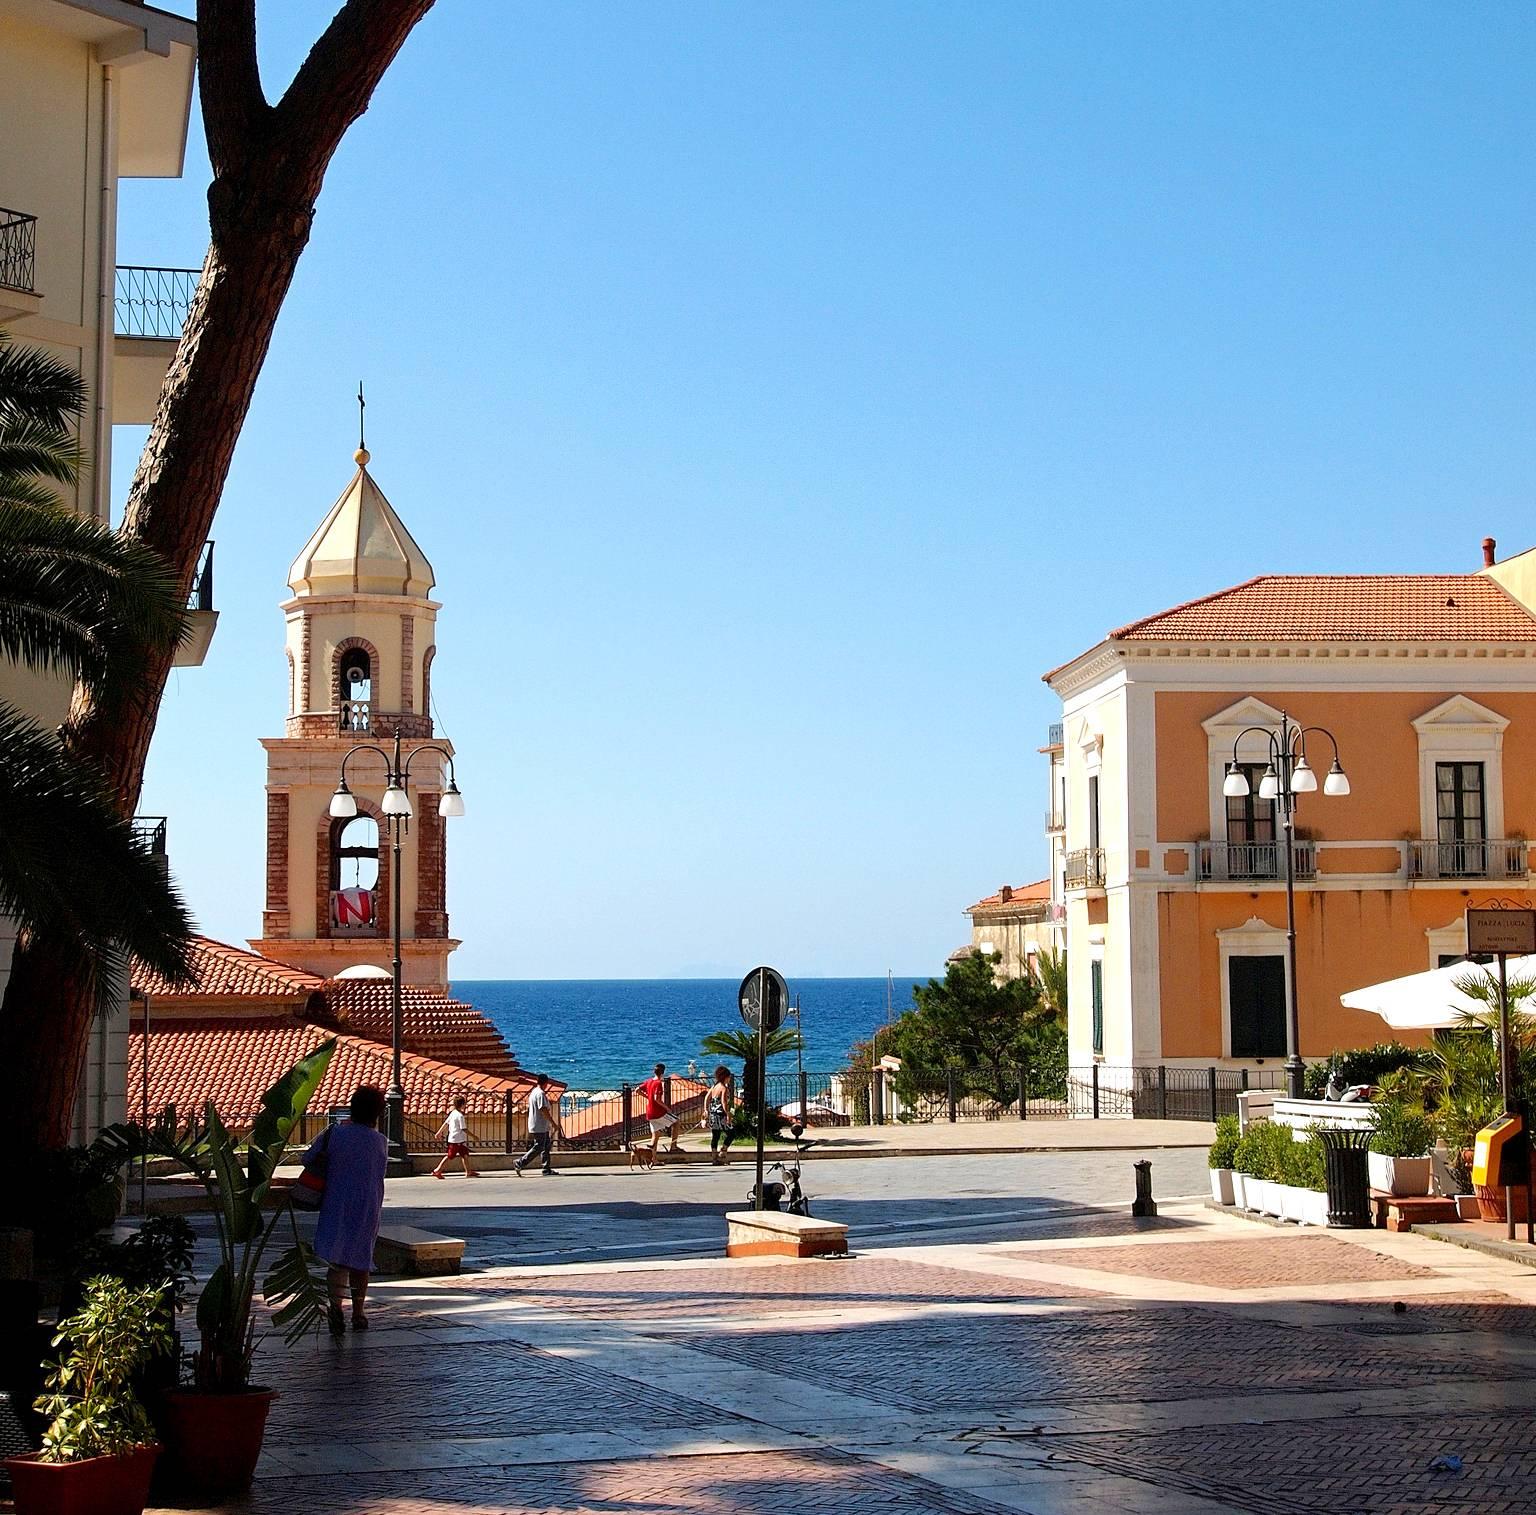 Santamaria piazza Residence Perla Bianca ristorante appartamento